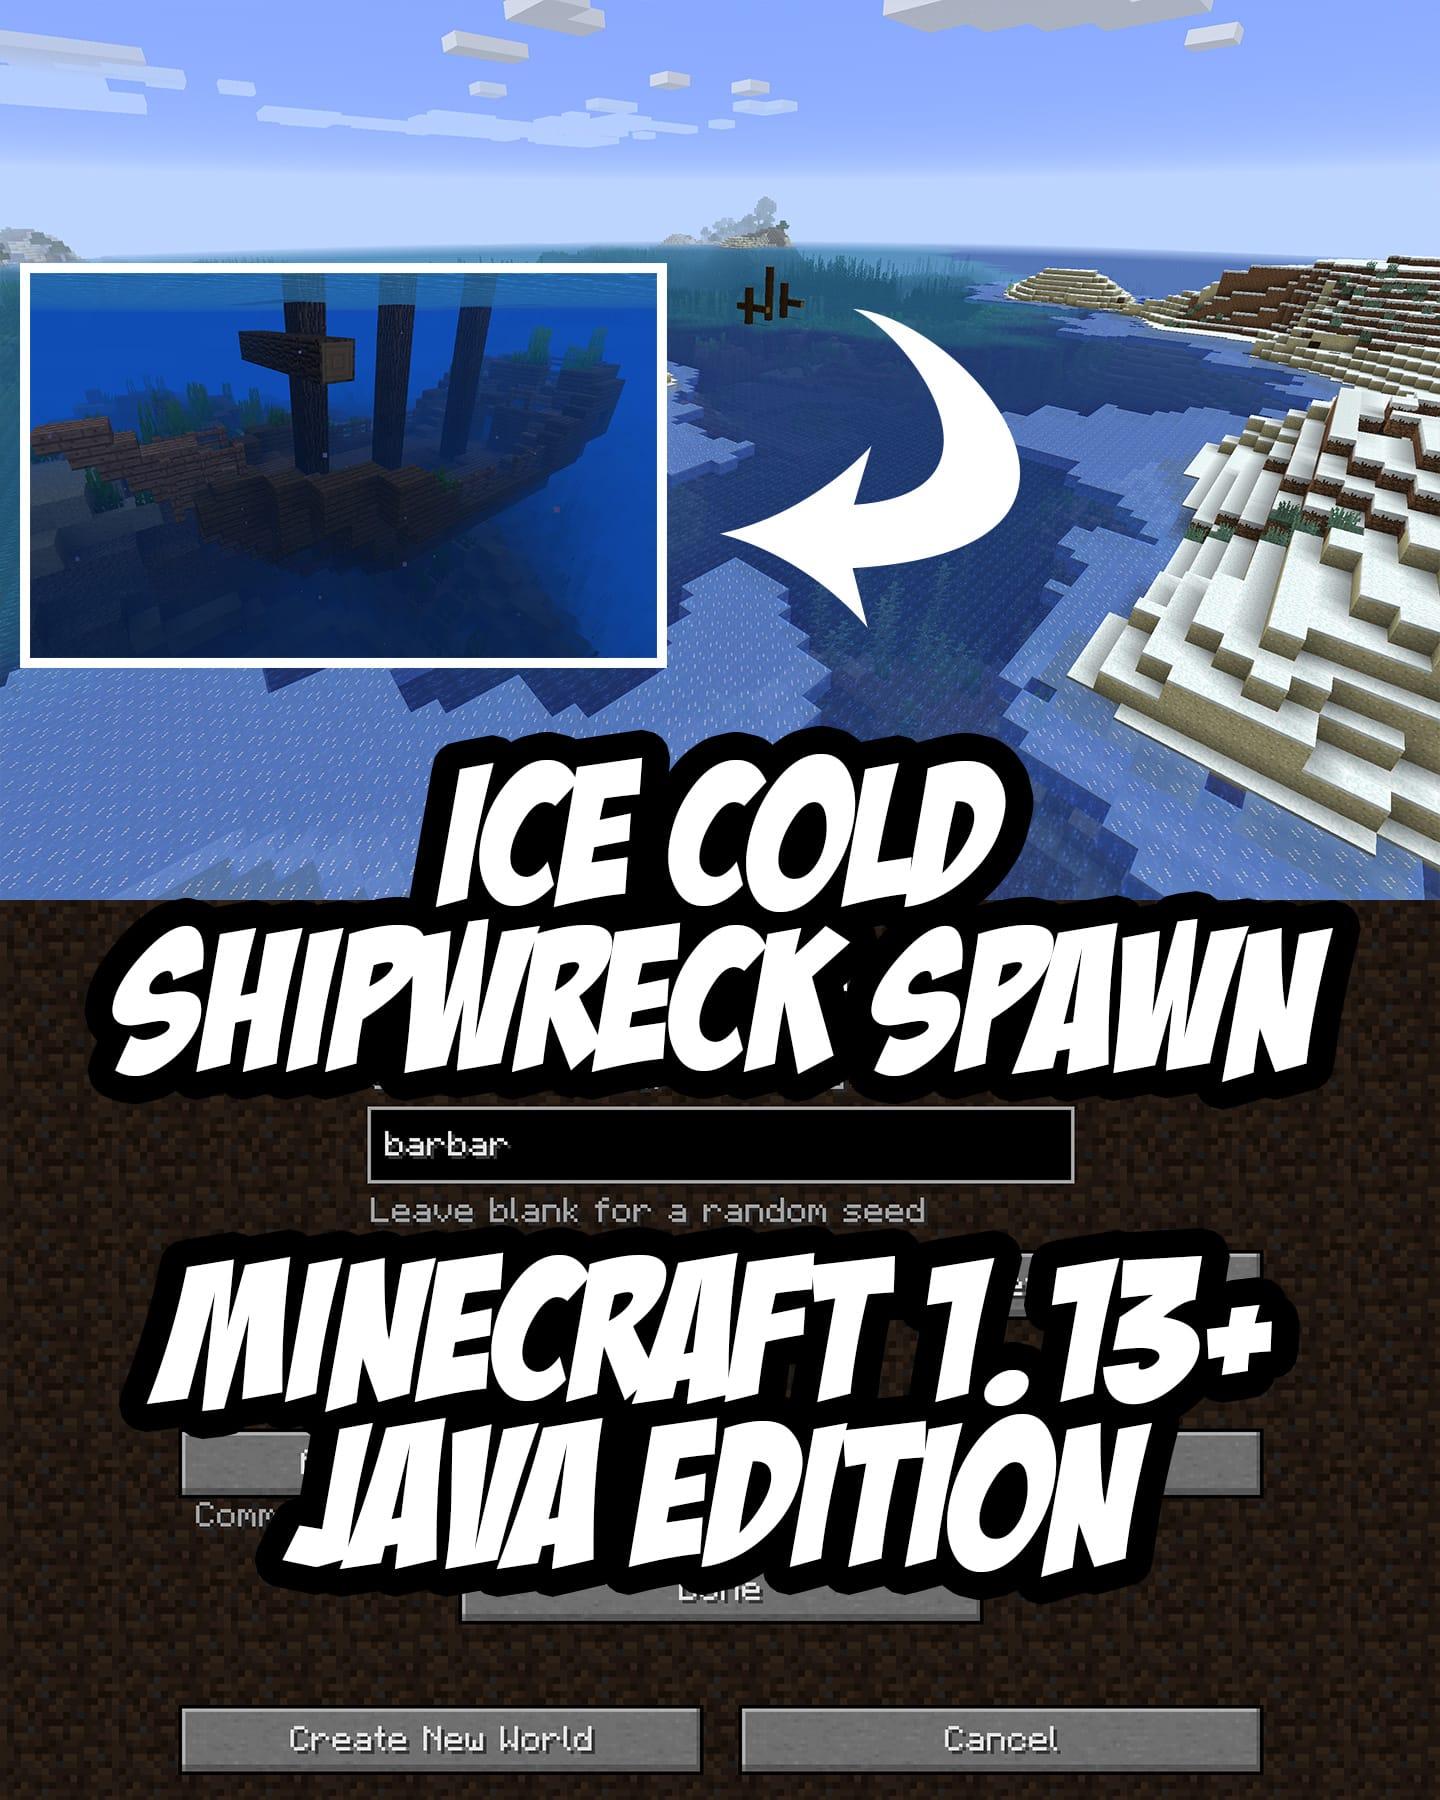 Minecraft 1.13+ Ice Cold Shipwreck Spawn Seed:barbar (-1396235488)